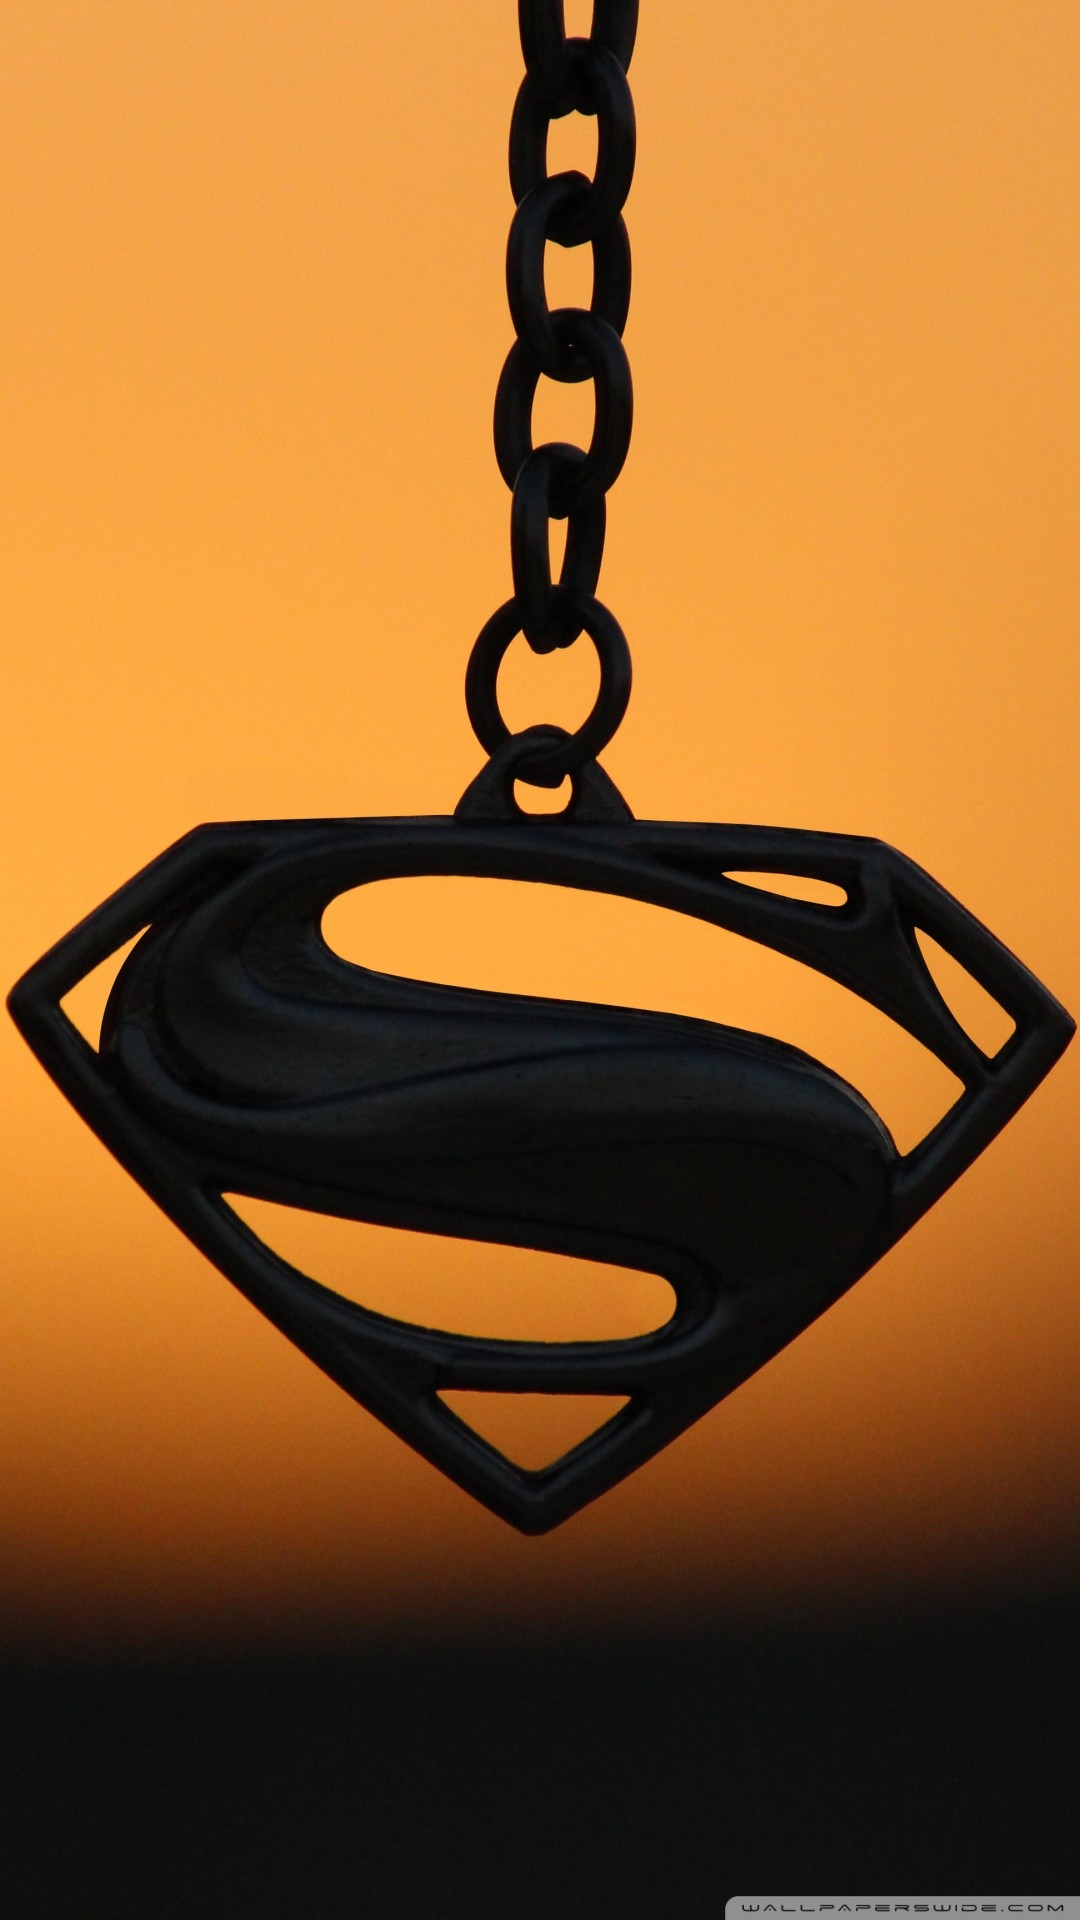 Free SUPERMAN LOGO phone wallpaper by mantha2012